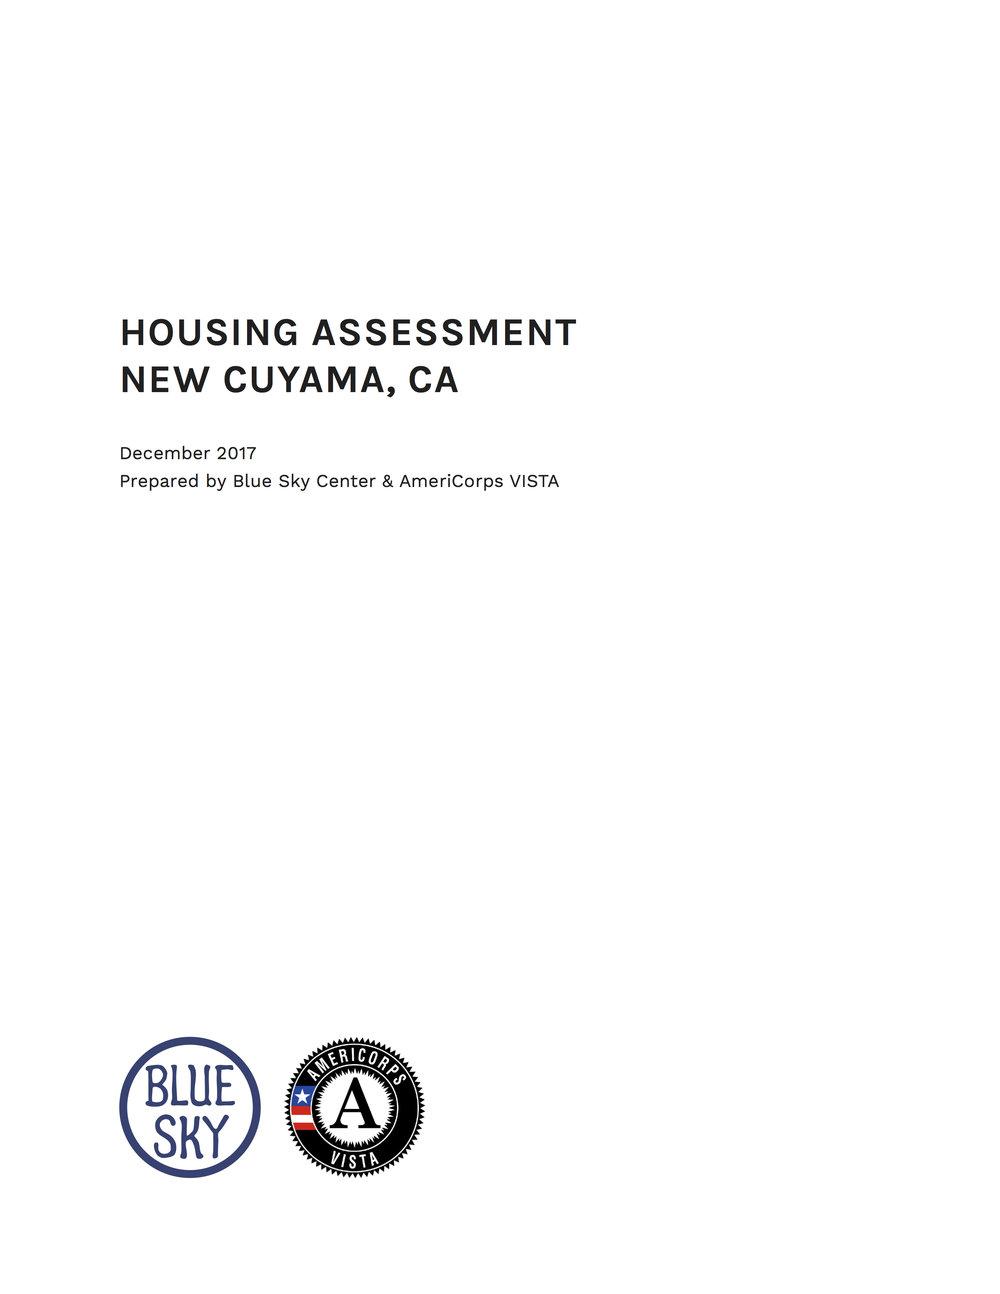 New Cuyama Housing Assessment